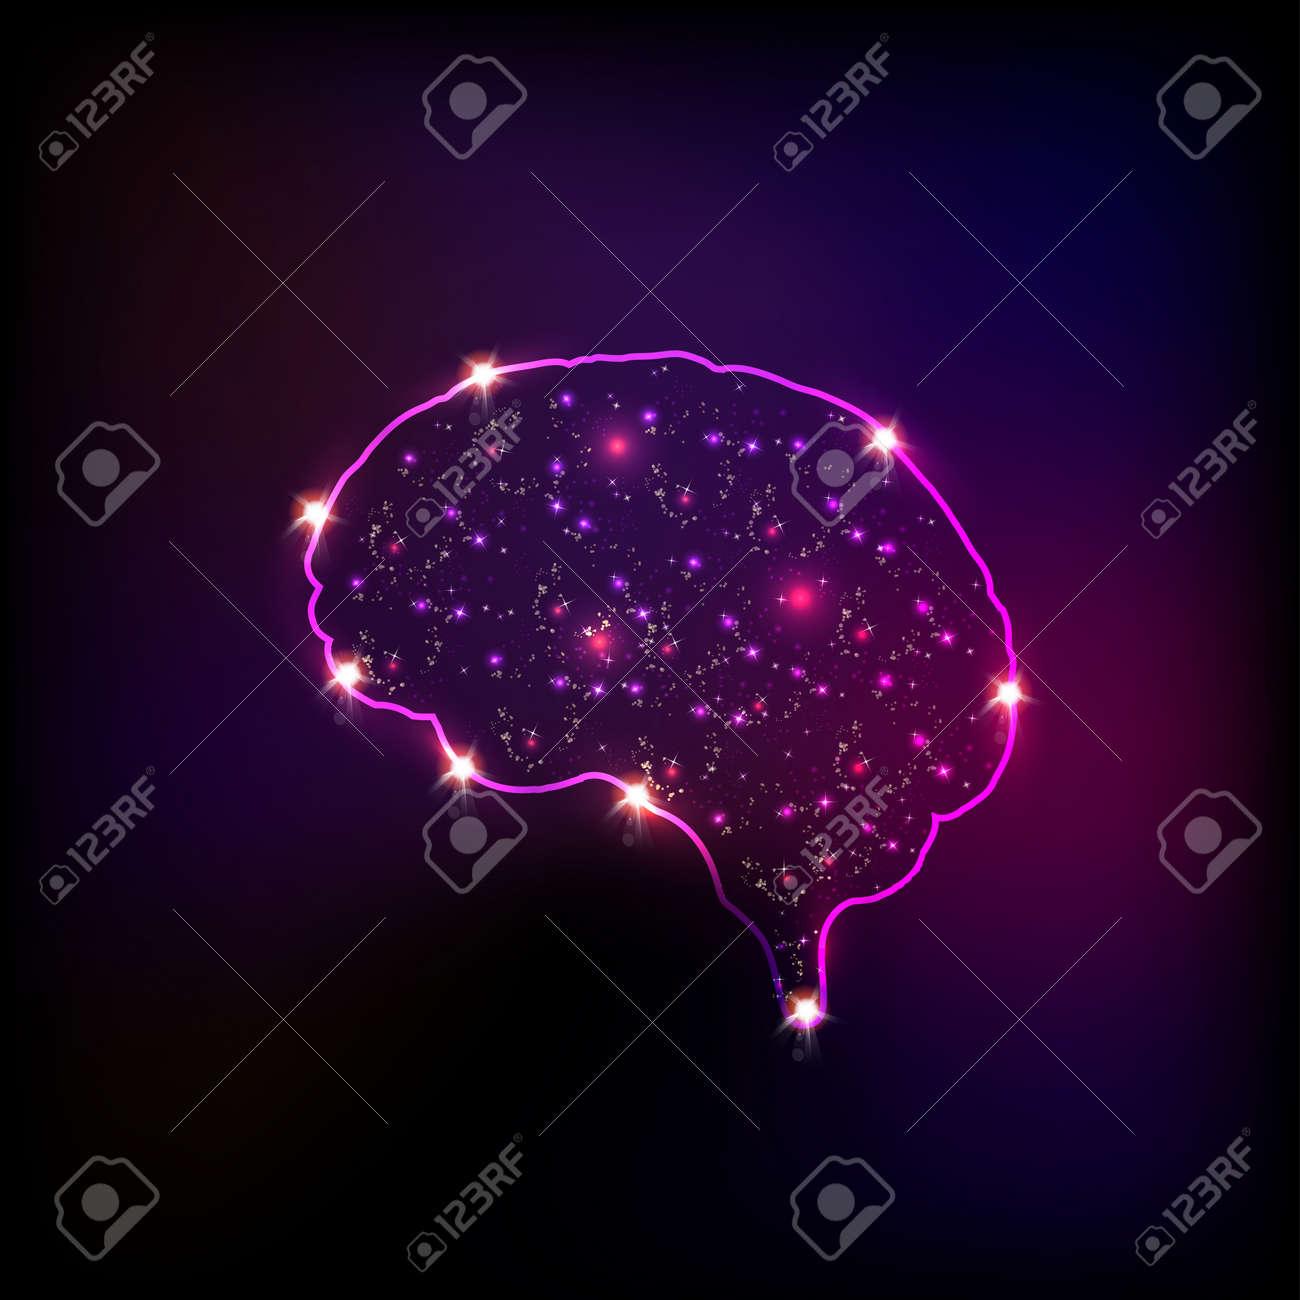 Abstract light human brain, easy editable - 35085722